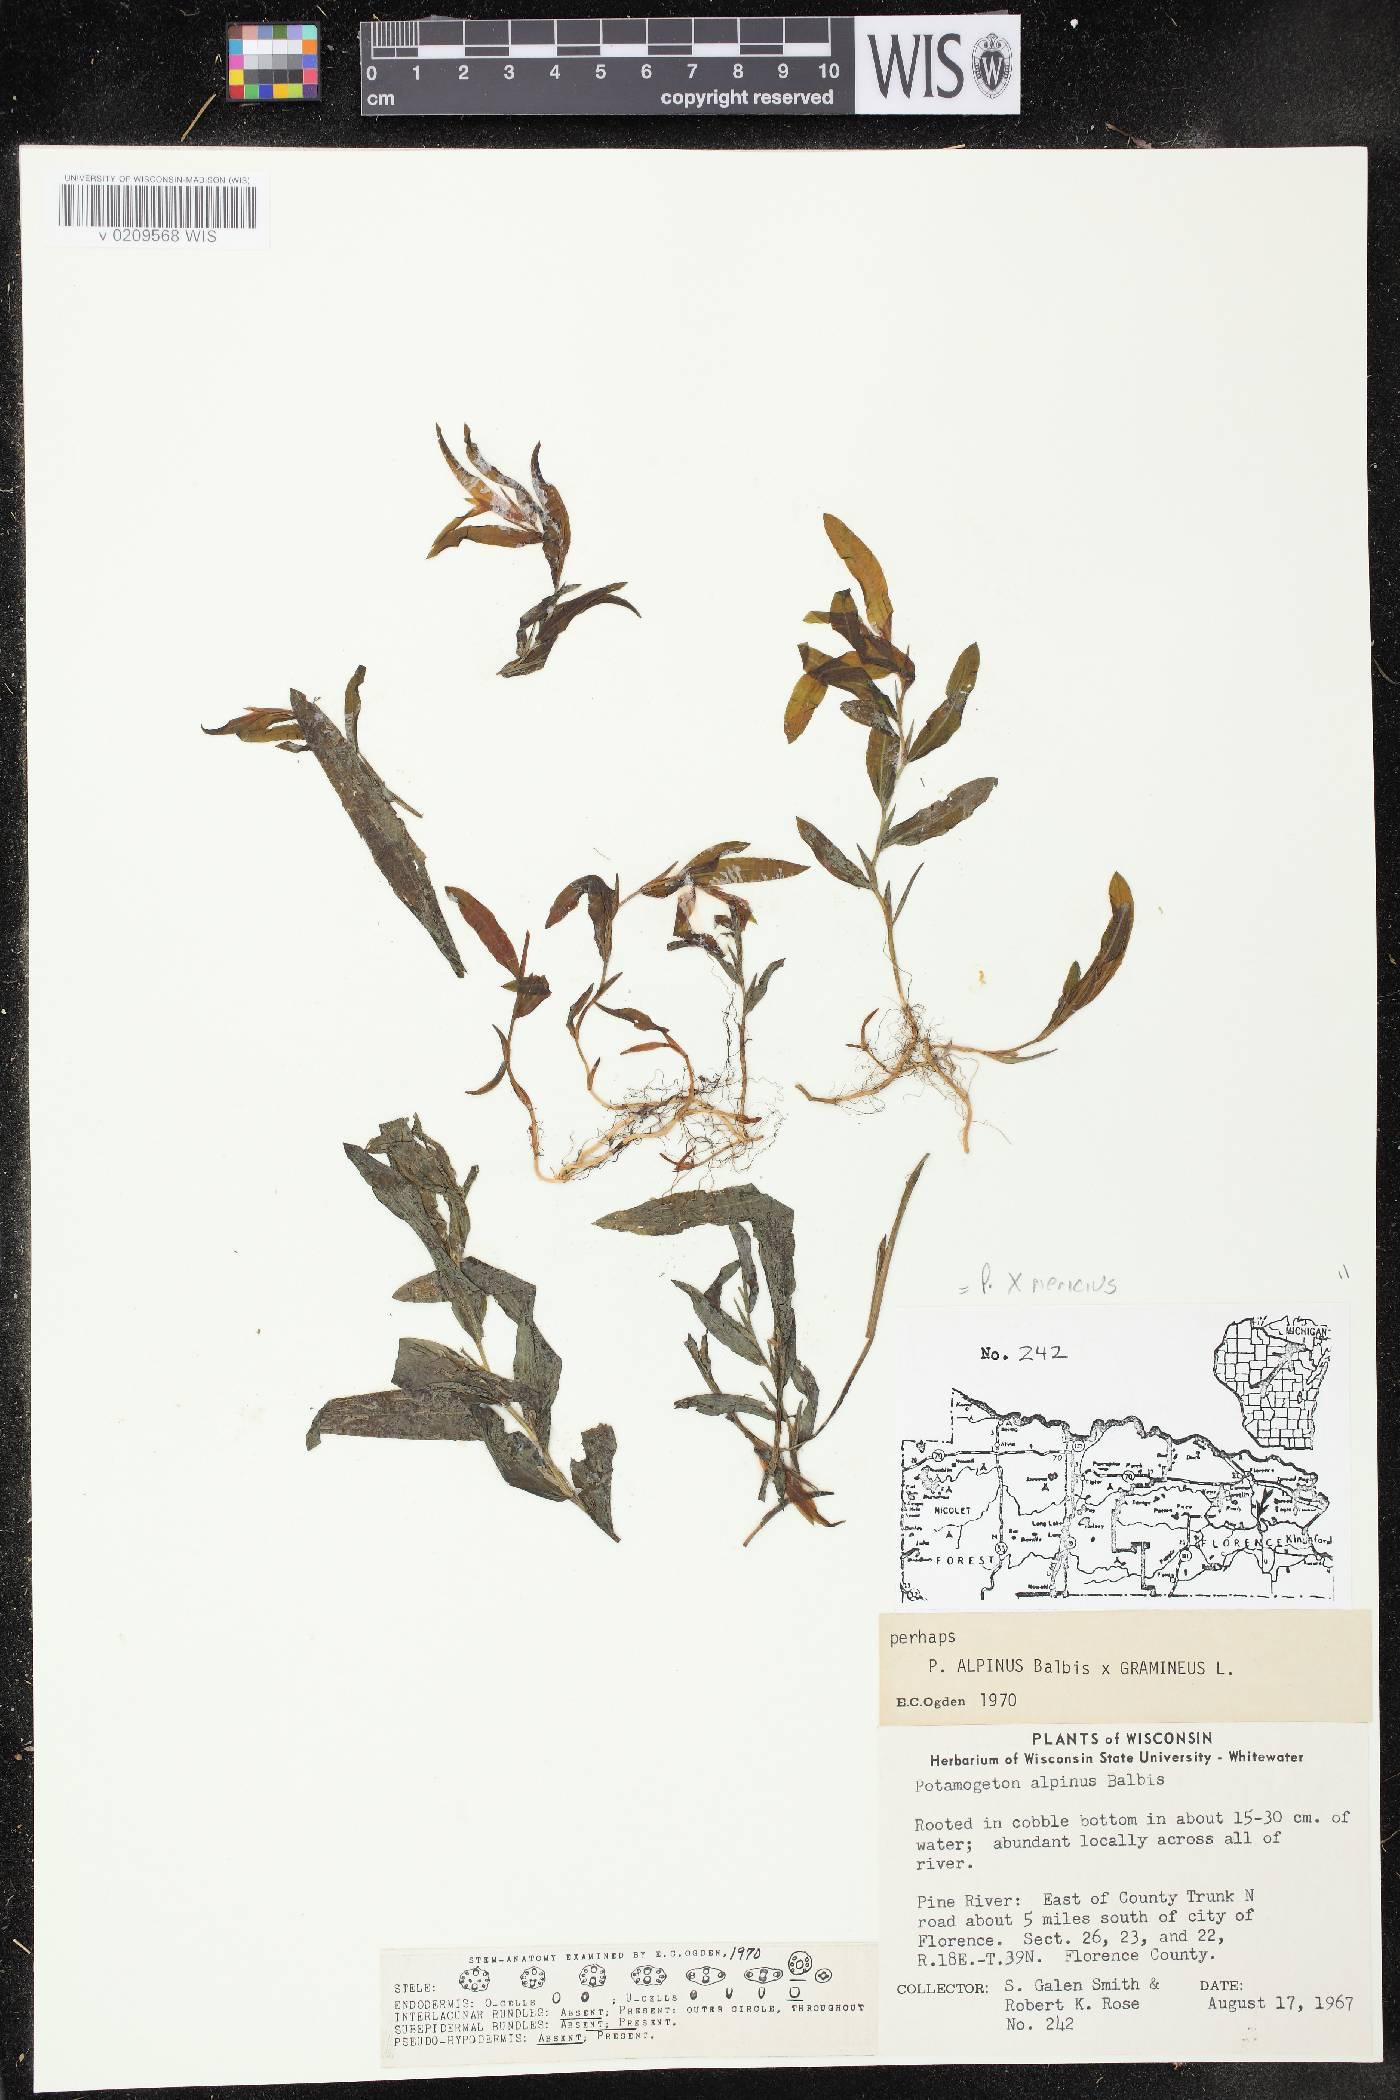 Potamogeton x nericius image